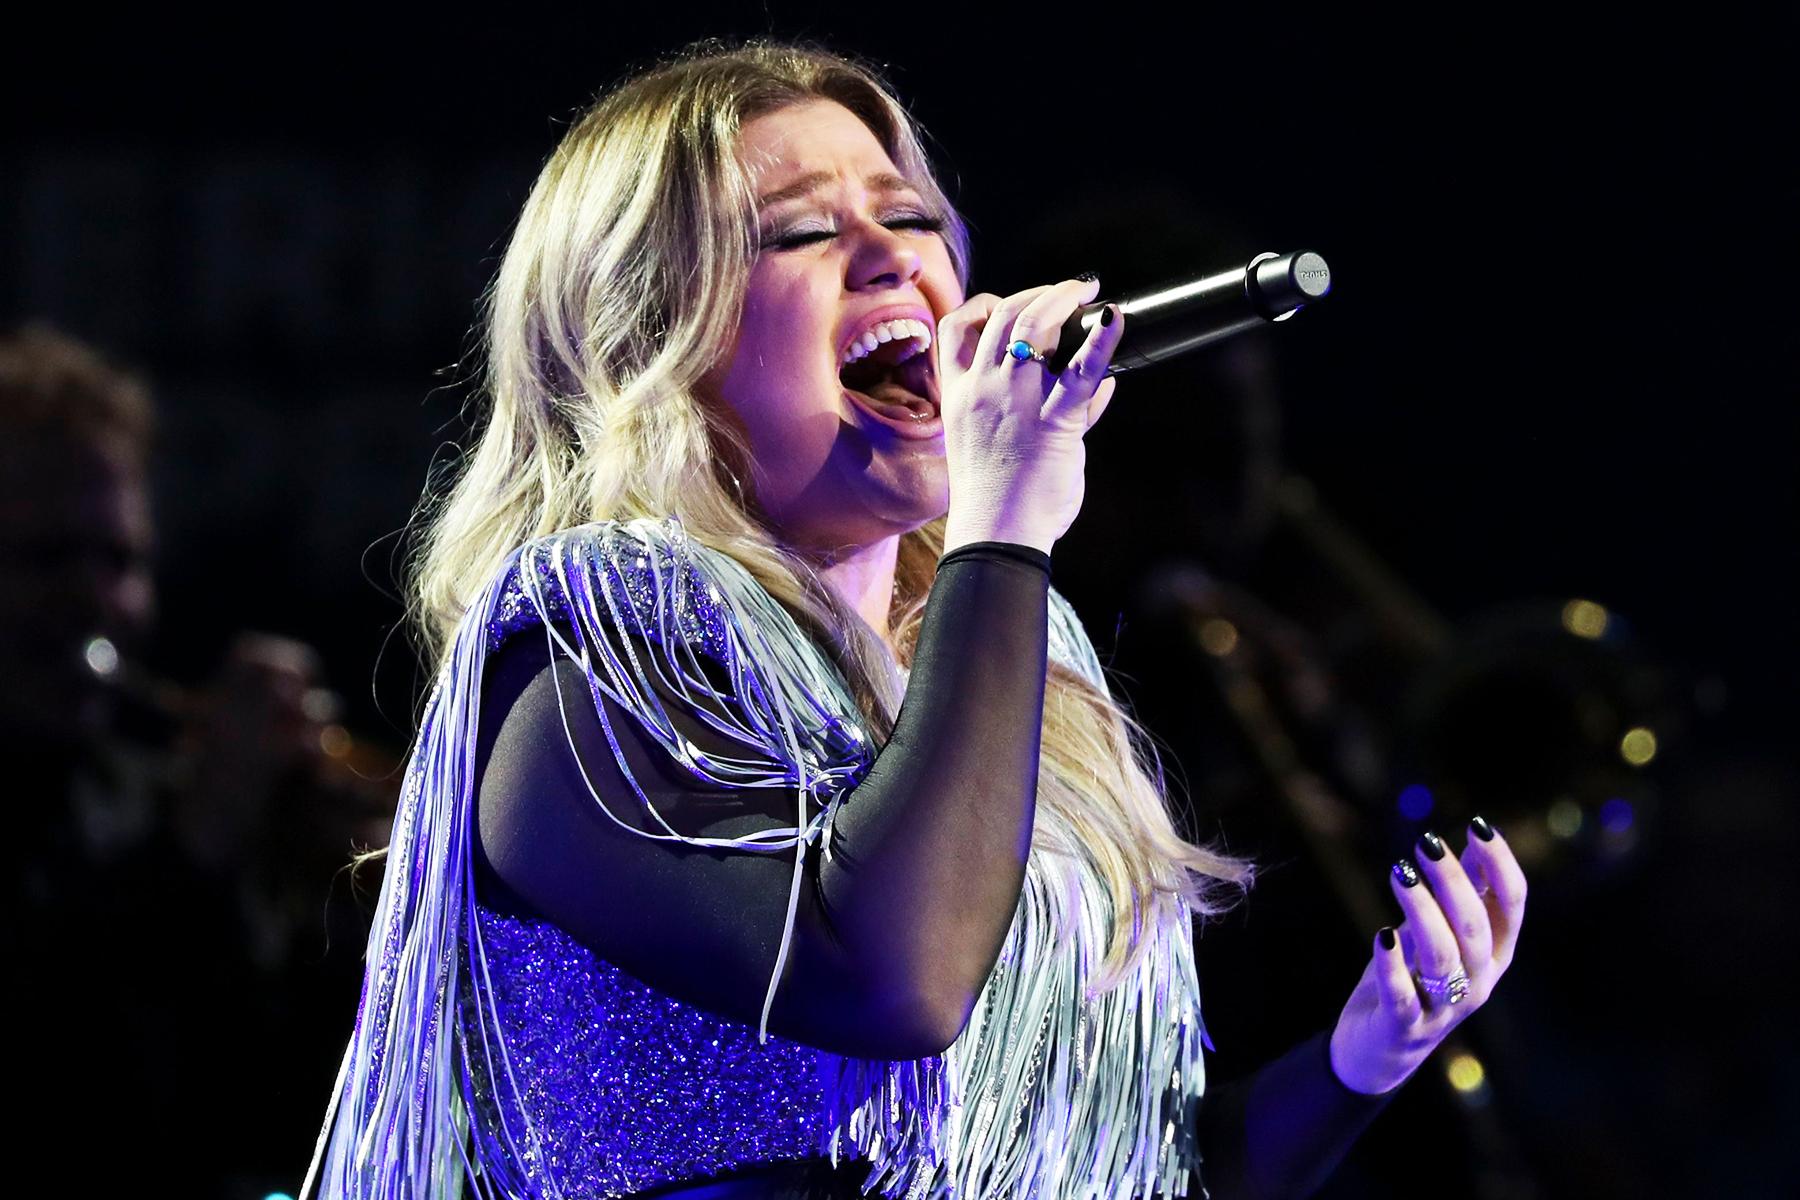 ICloud Kelly Clarkson nudes (83 photos), Tits, Hot, Twitter, bra 2017